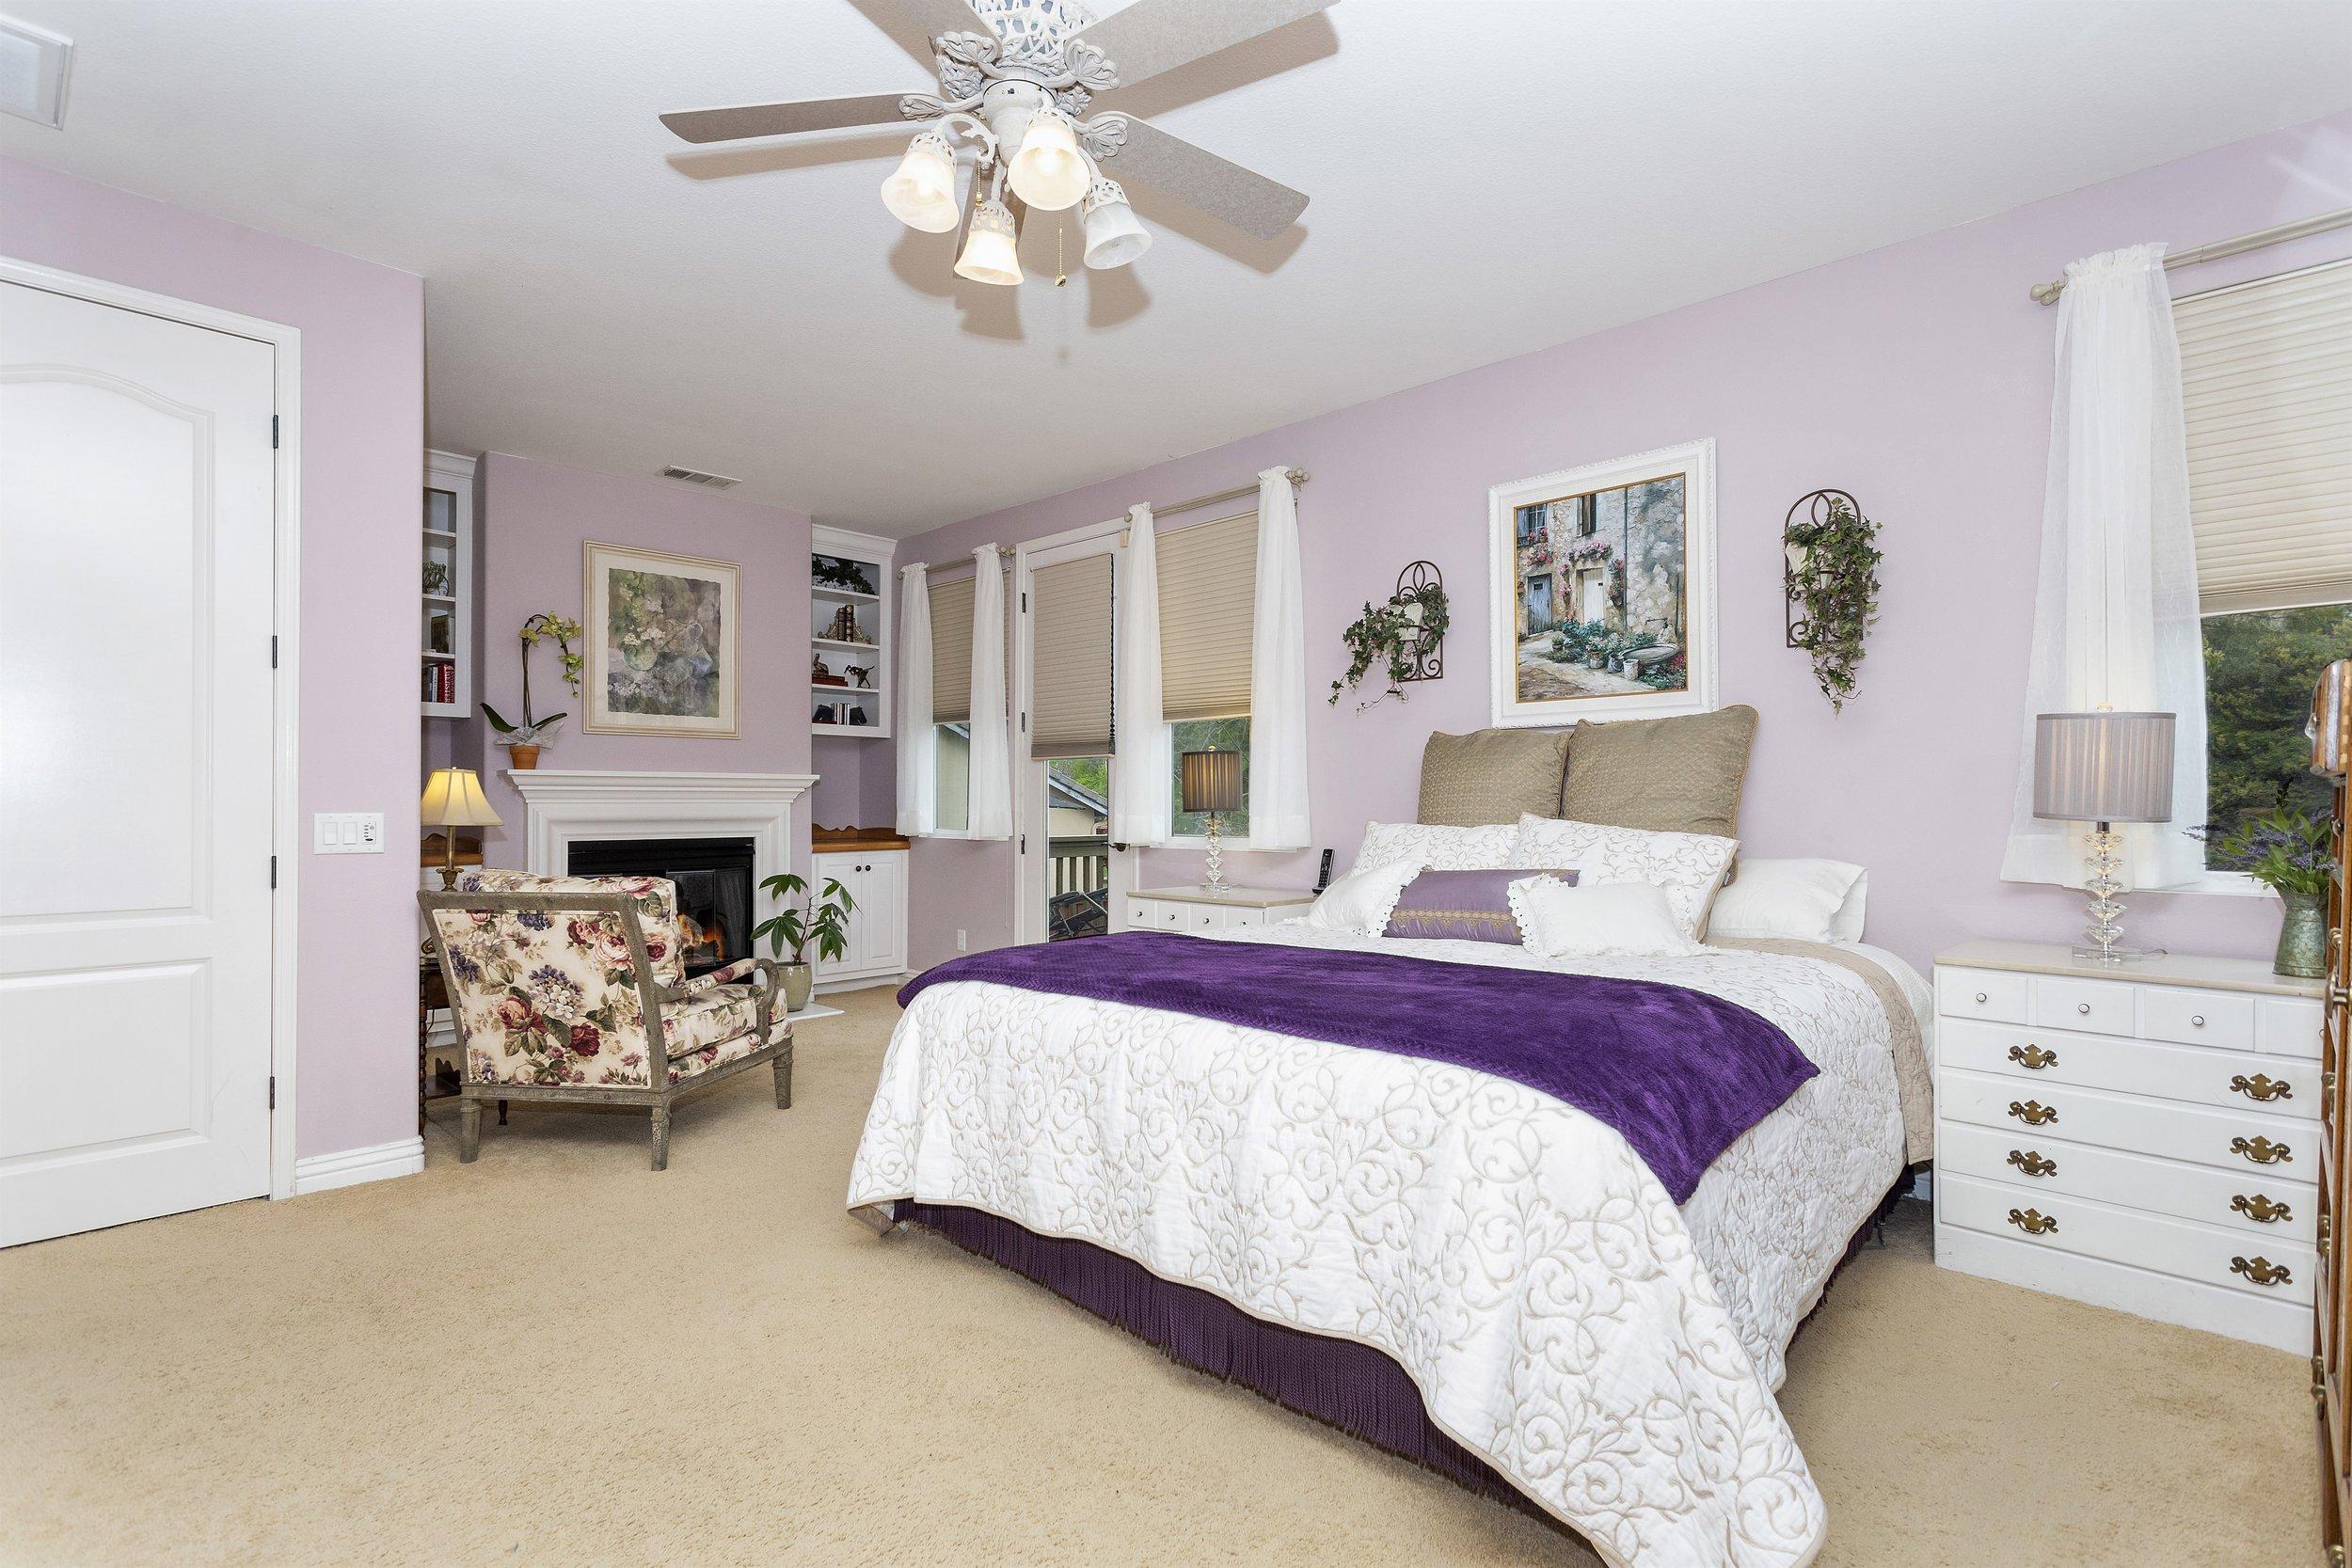 037_2nd Floor Master Bedroom.jpg